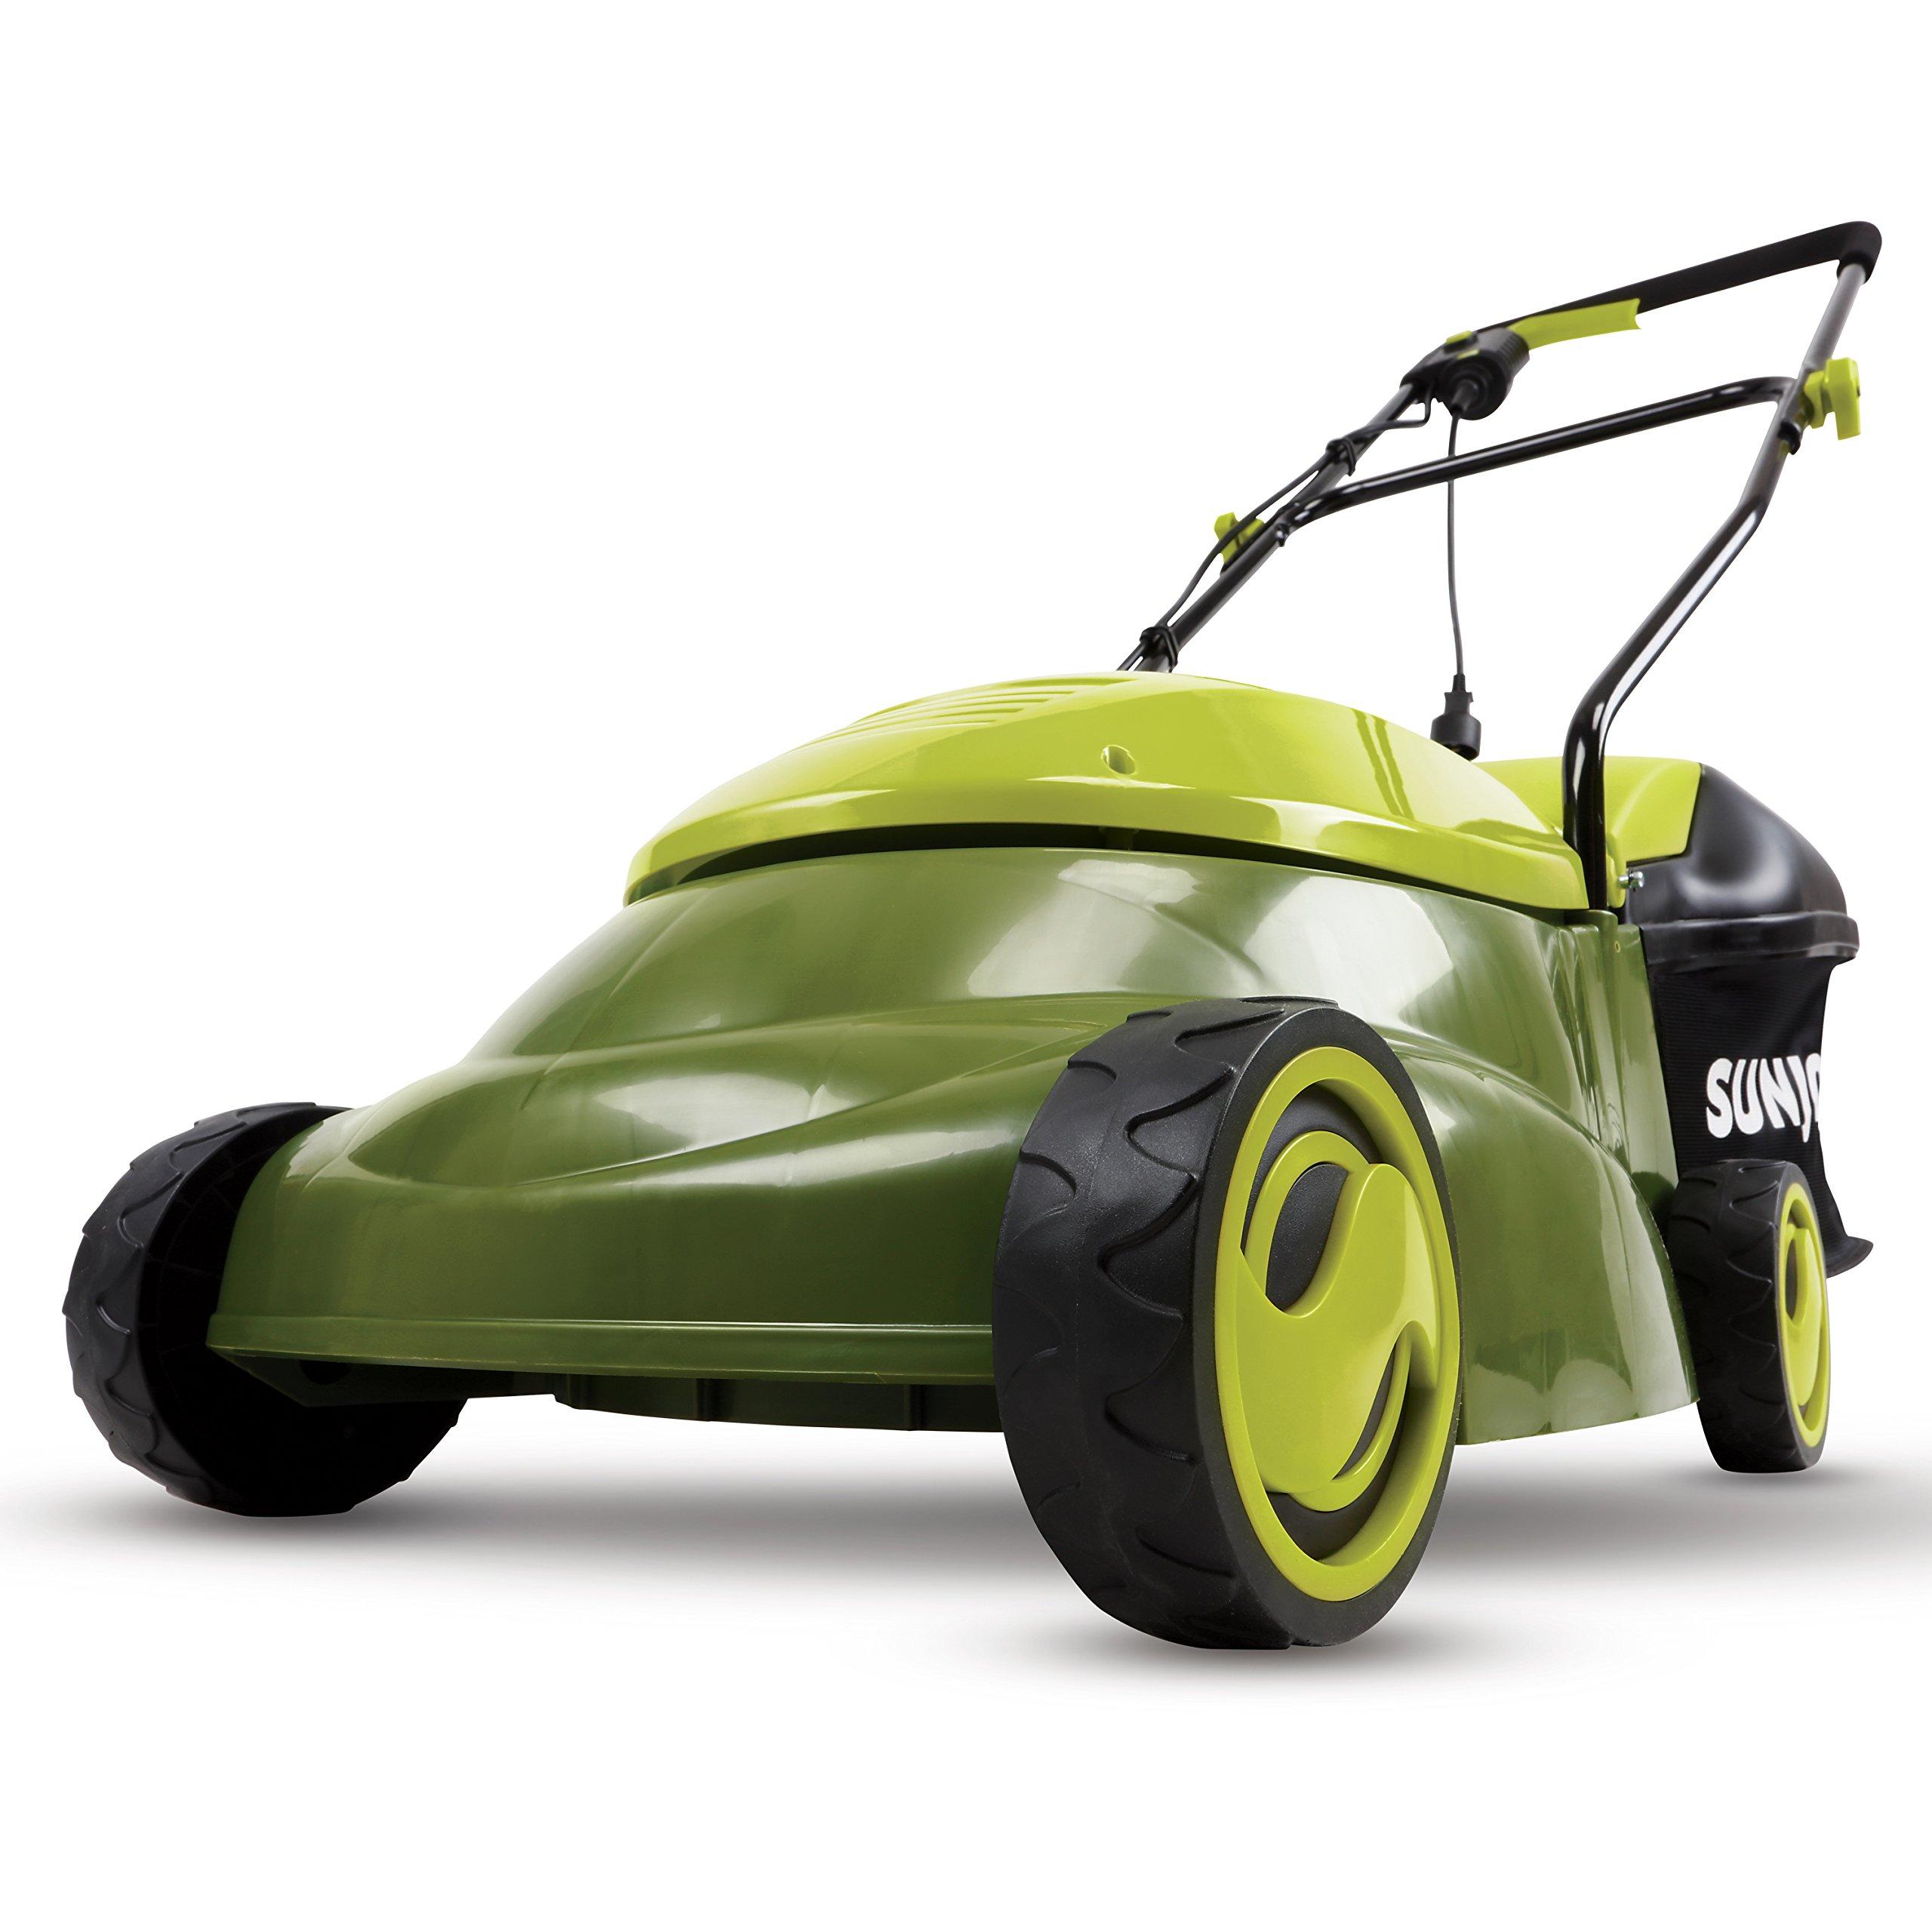 Sun Joe MJ401E Mow Joe 14-Inch 12 Amp Electric Lawn Mower With Grass Bag product image